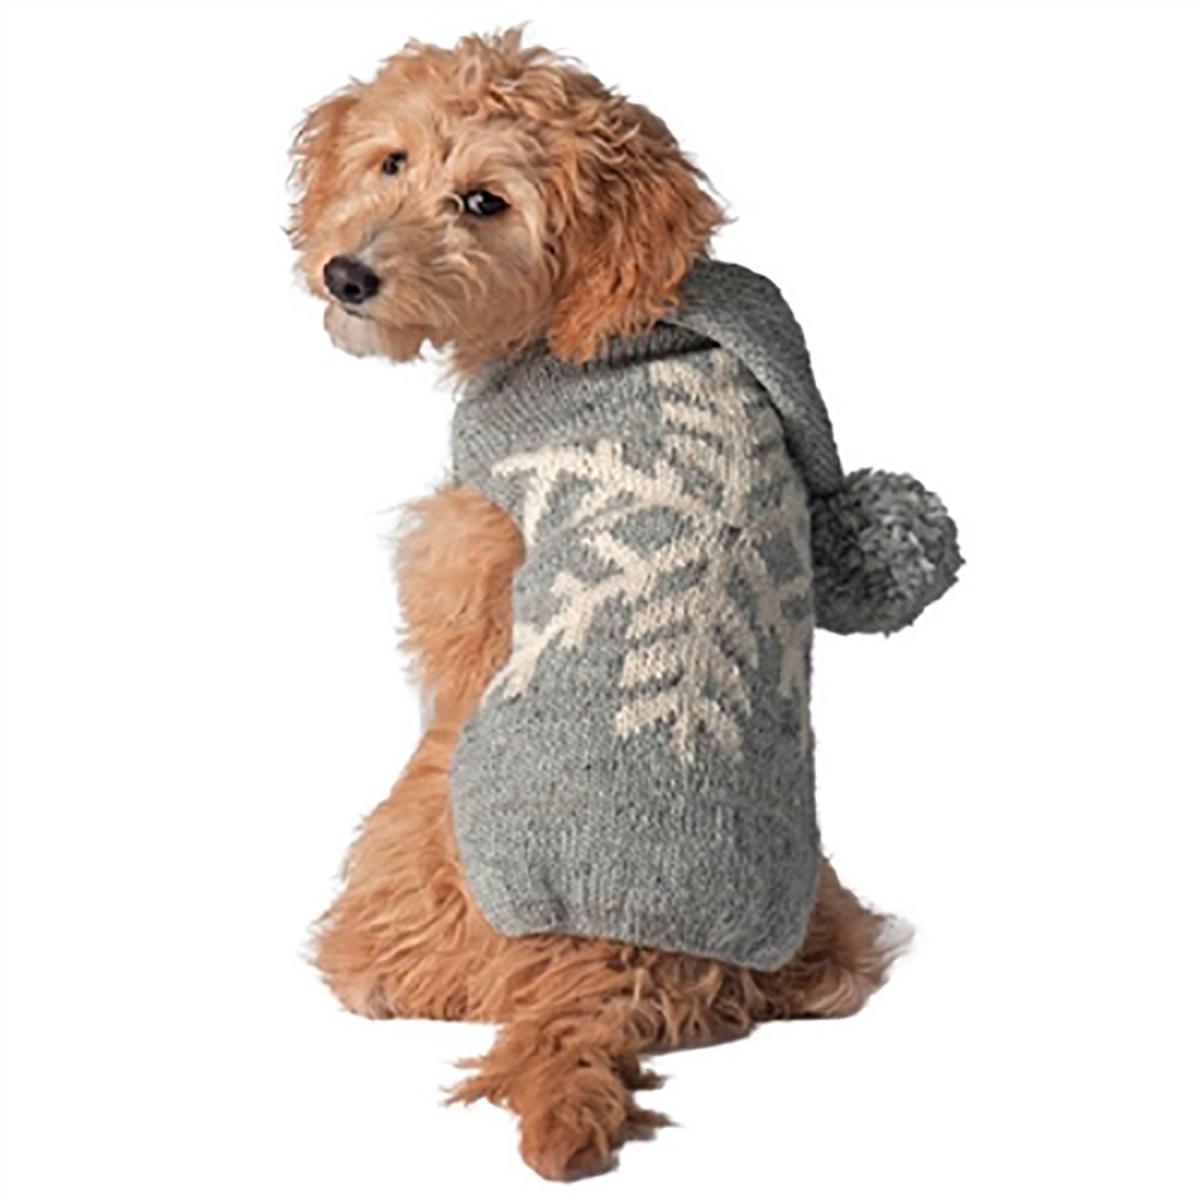 Handmade Alpaca Snowflake Dog Sweater Hoodie - Gray